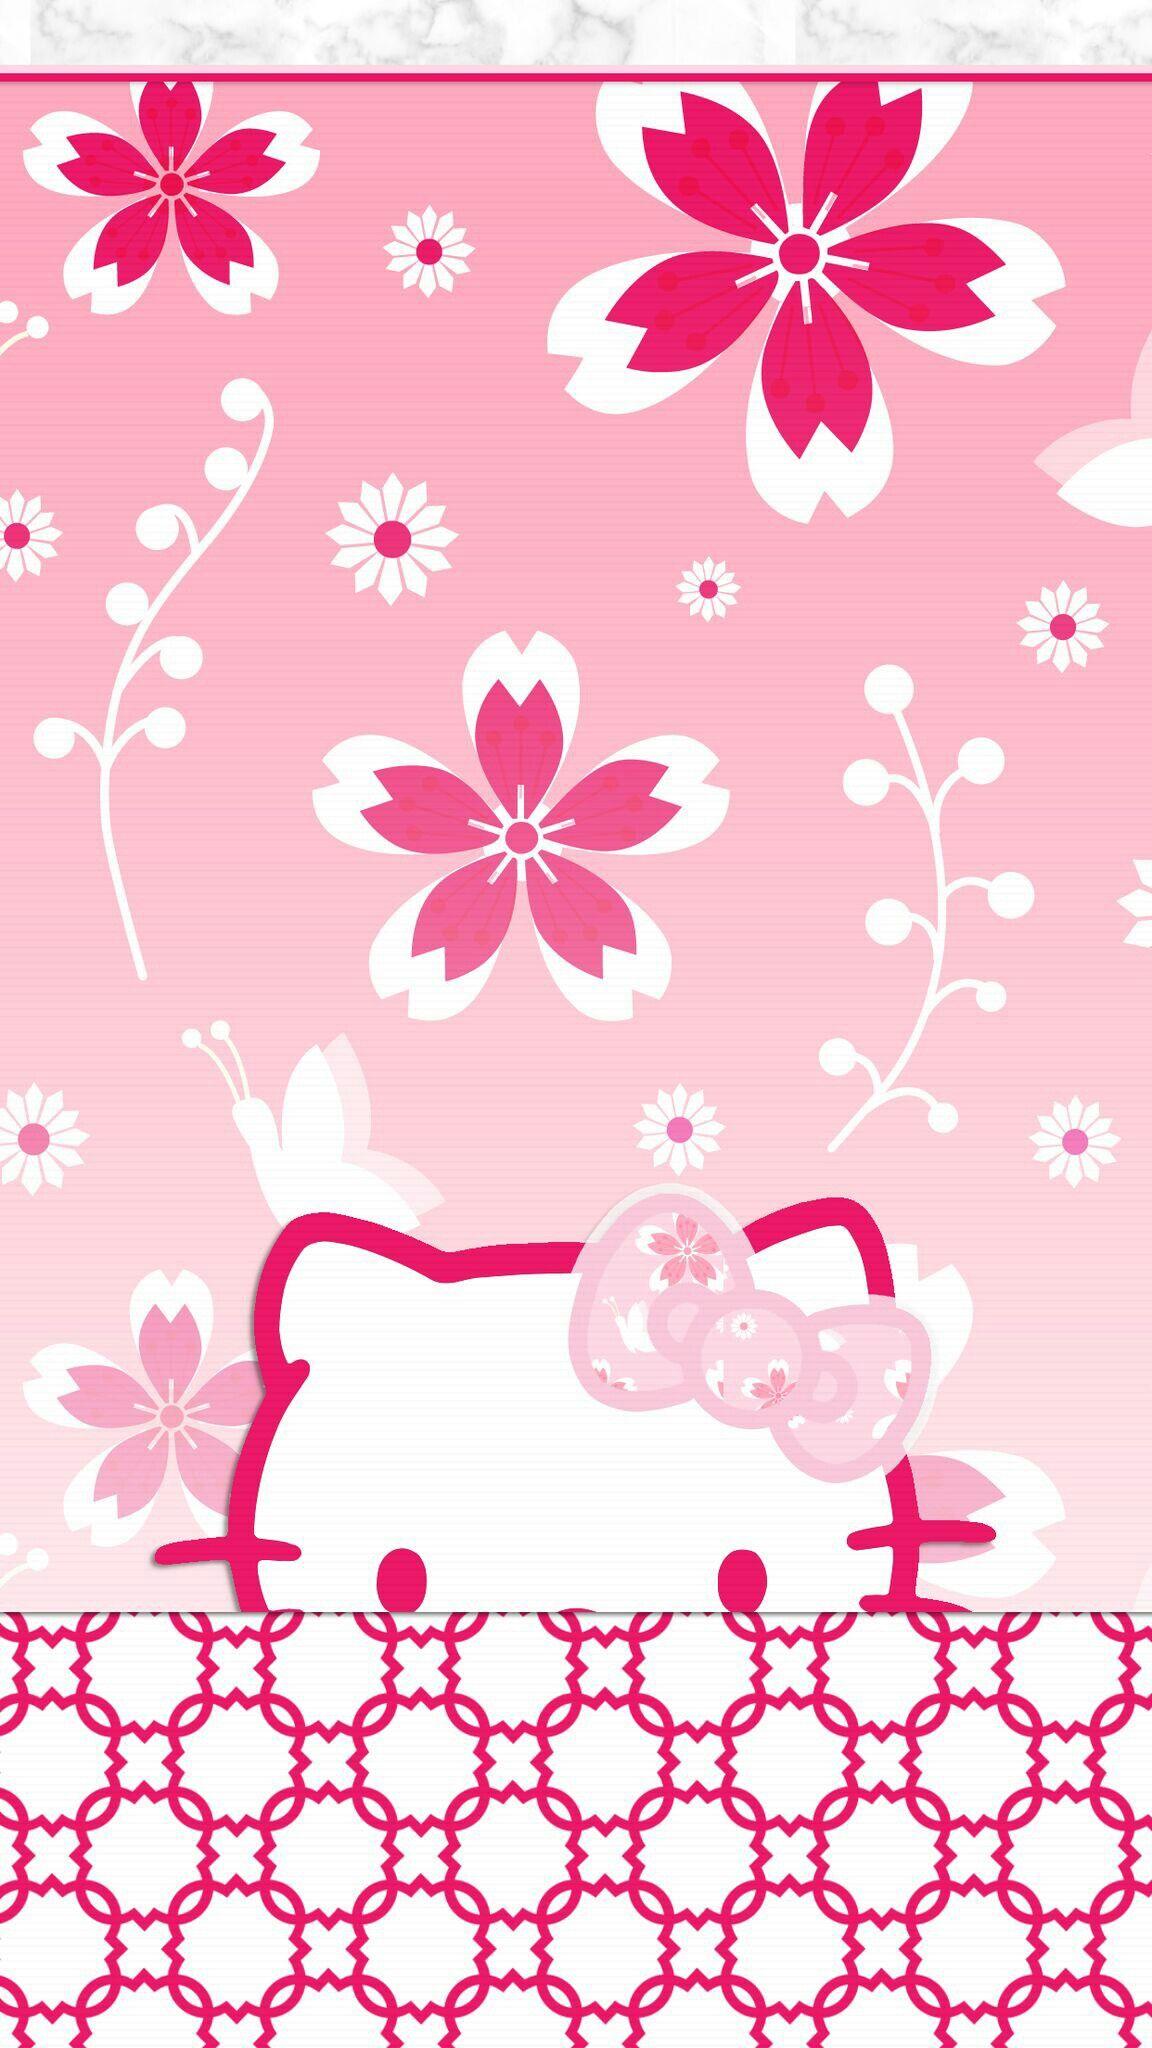 Cool Wallpaper Hello Kitty Floral - f79df0b050269e7692ed4e2cb72d27db  Trends_809689.jpg